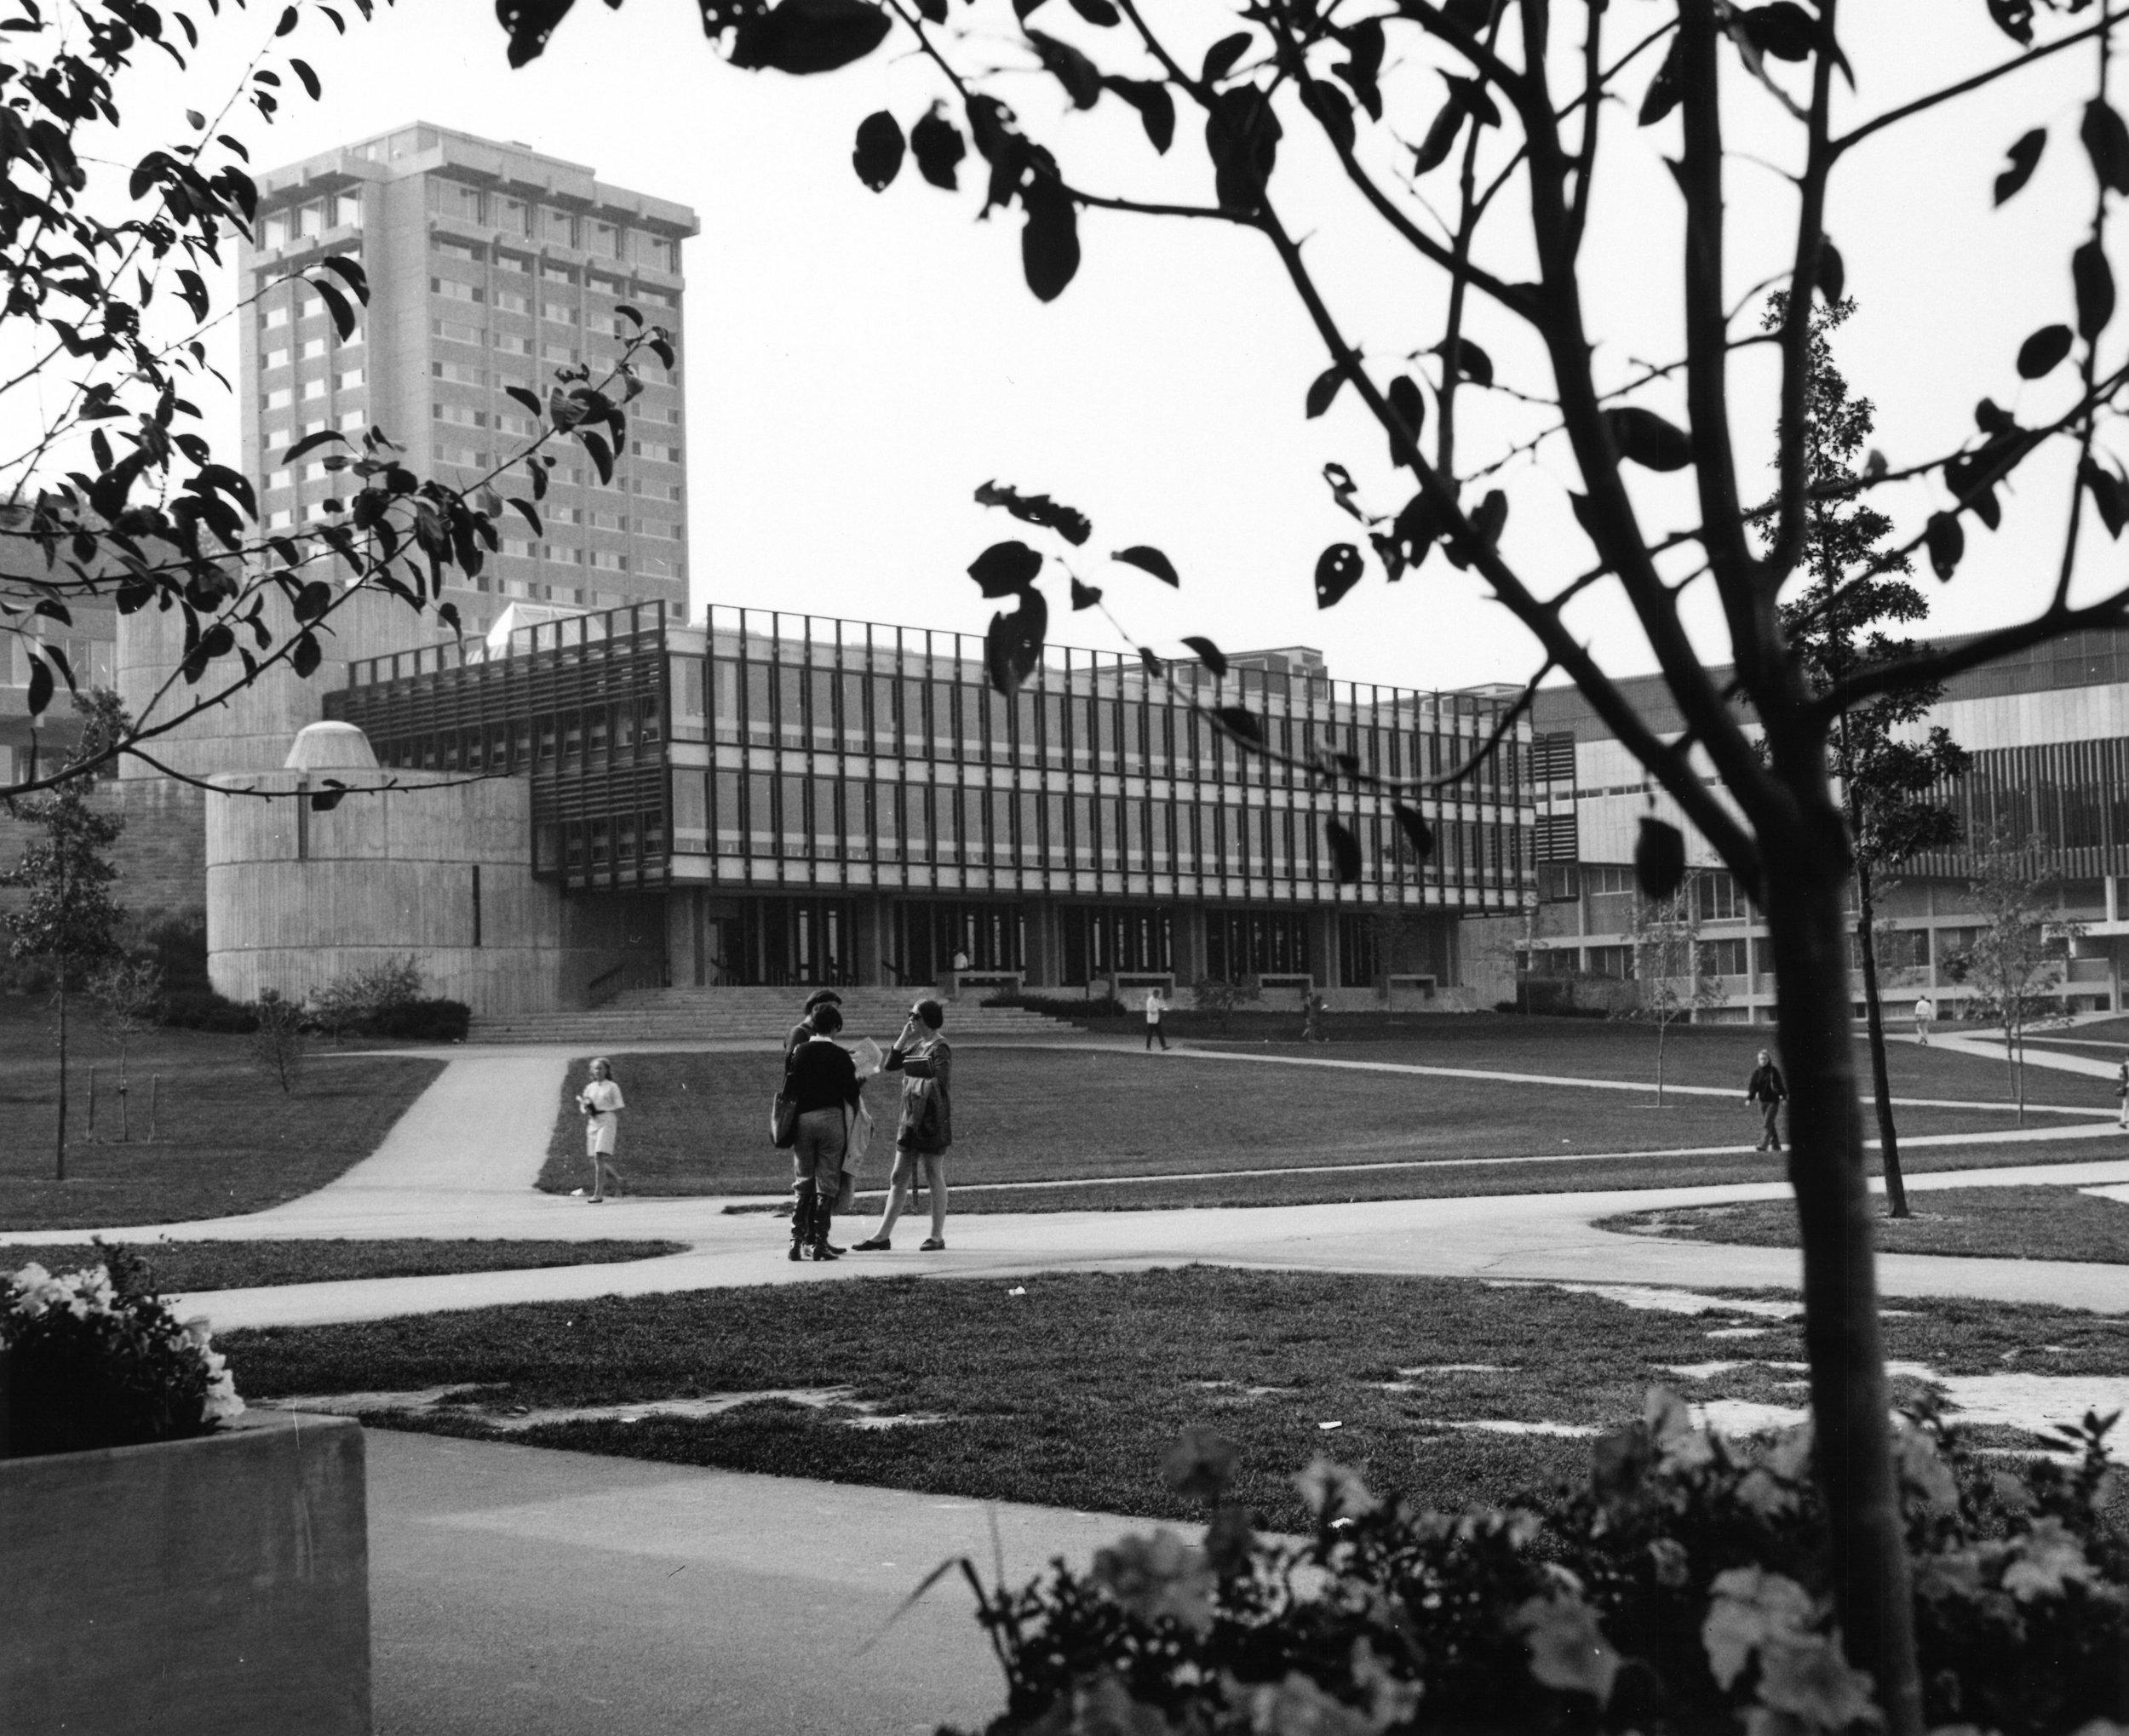 Ithaca College - Ithaca, NY